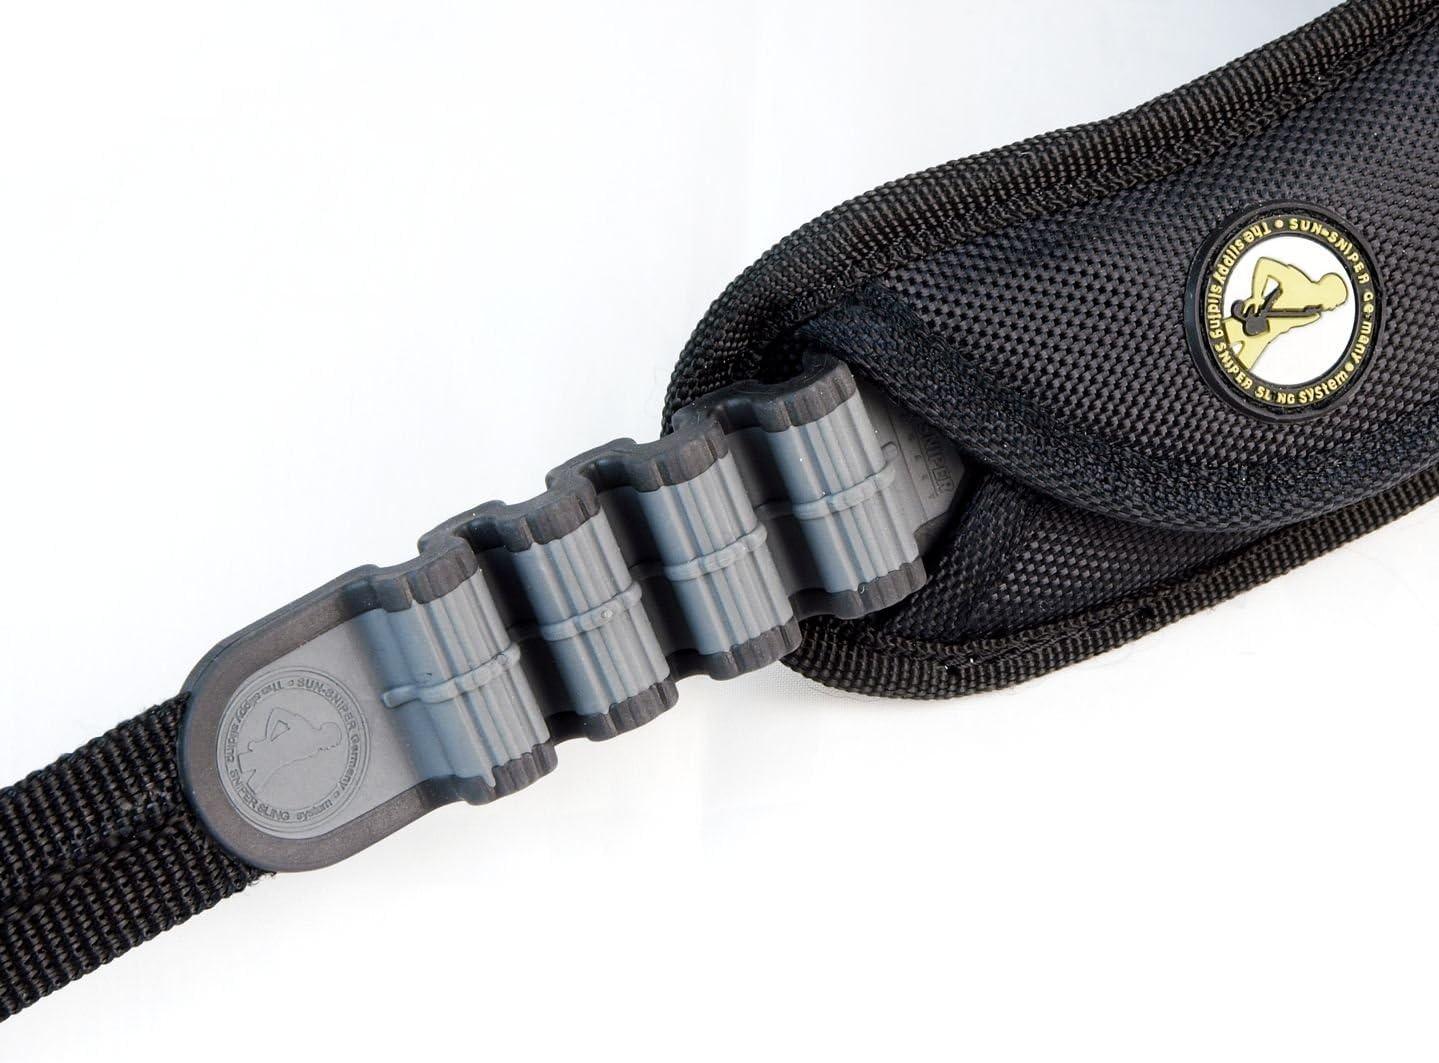 Sun Sniper Ssn Rb One Rotaball Basic Strap Camera Photo